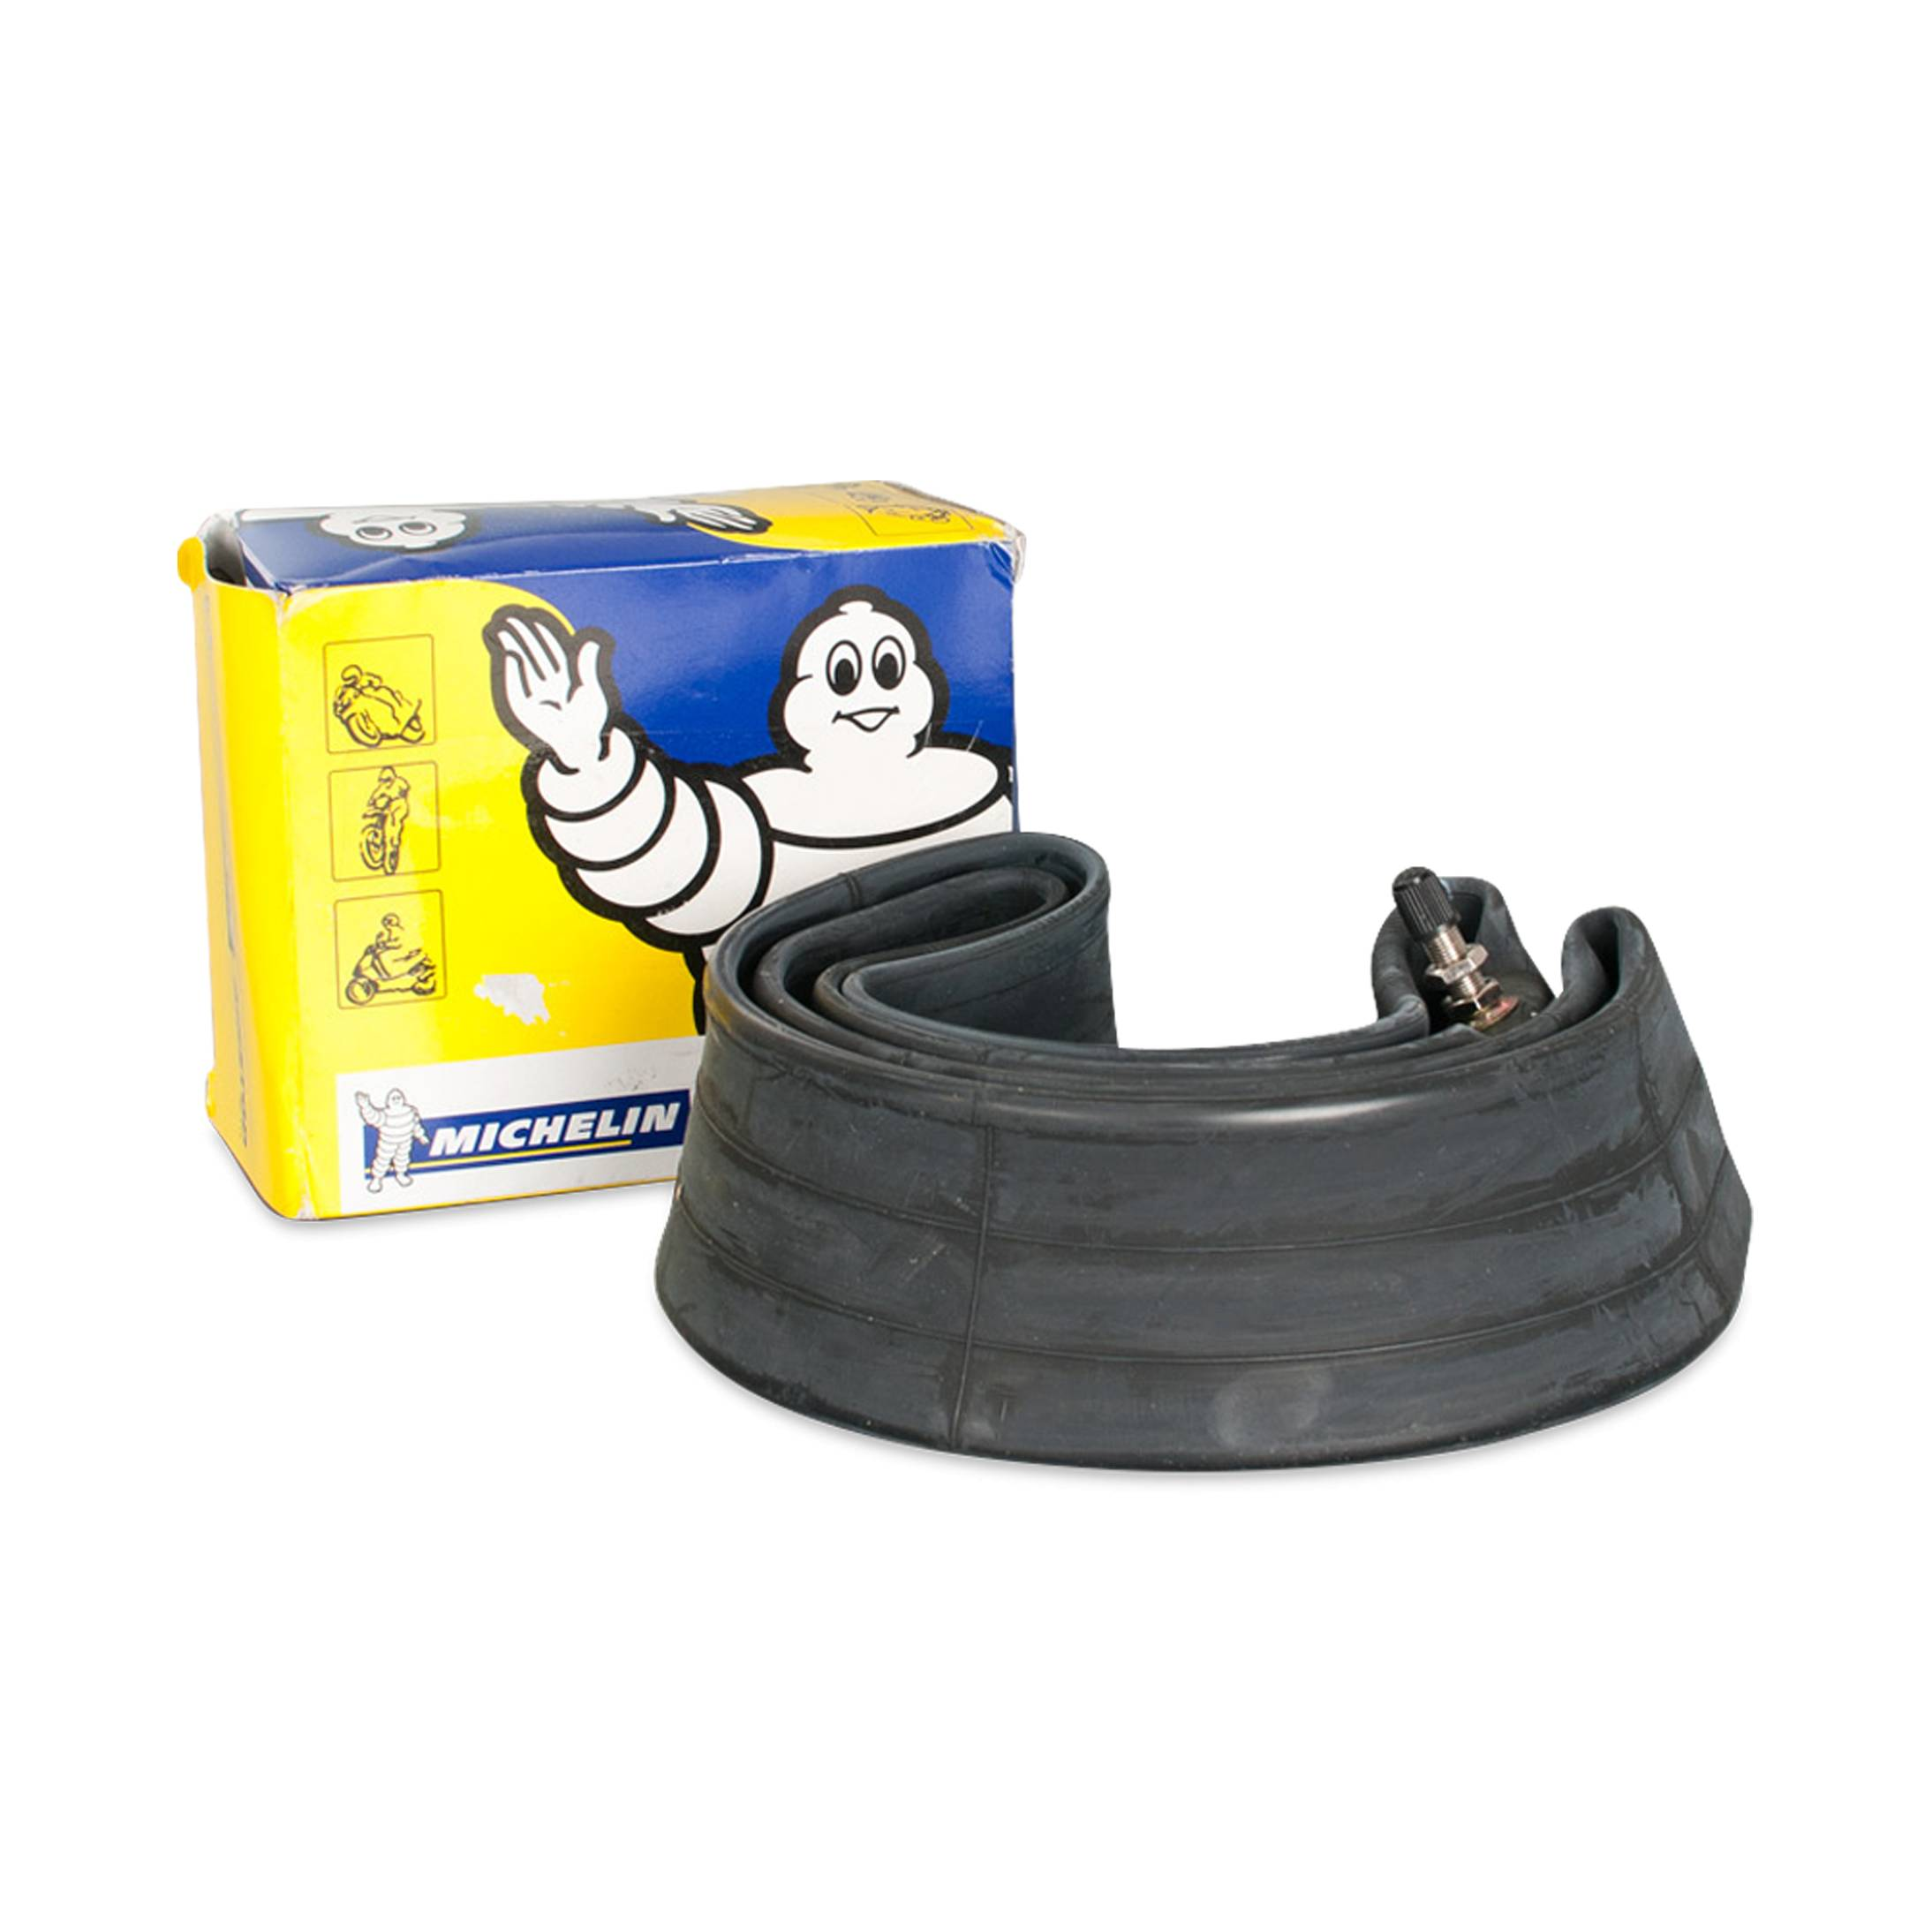 Michelin Schlauch Michelin Heavy Duty